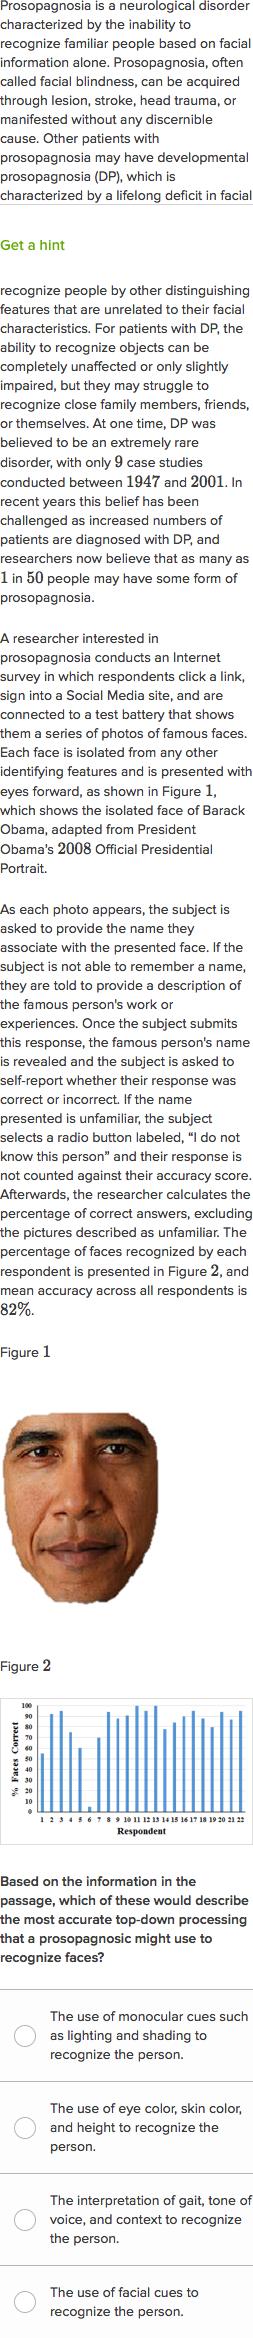 sleep disorders thesis statement